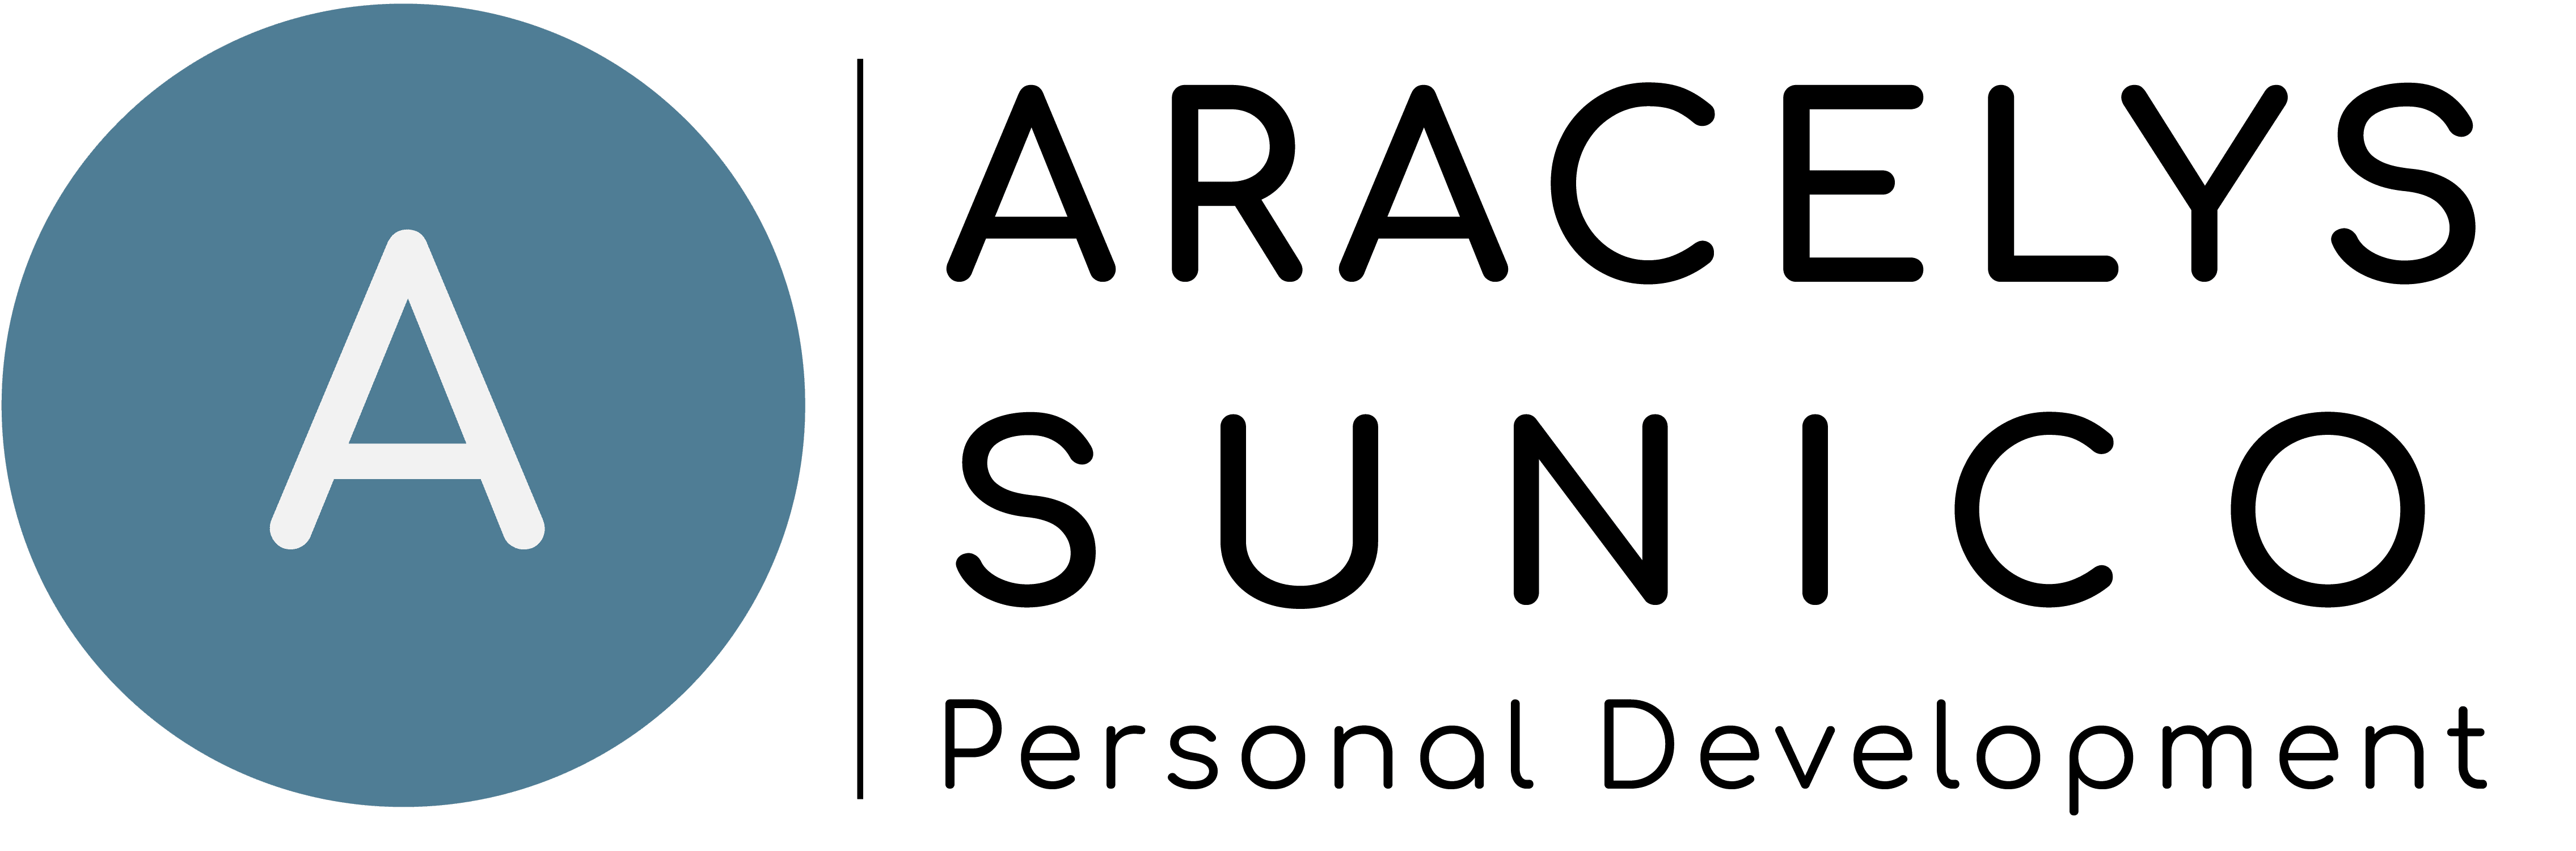 Aracelys Sunico Personal Development